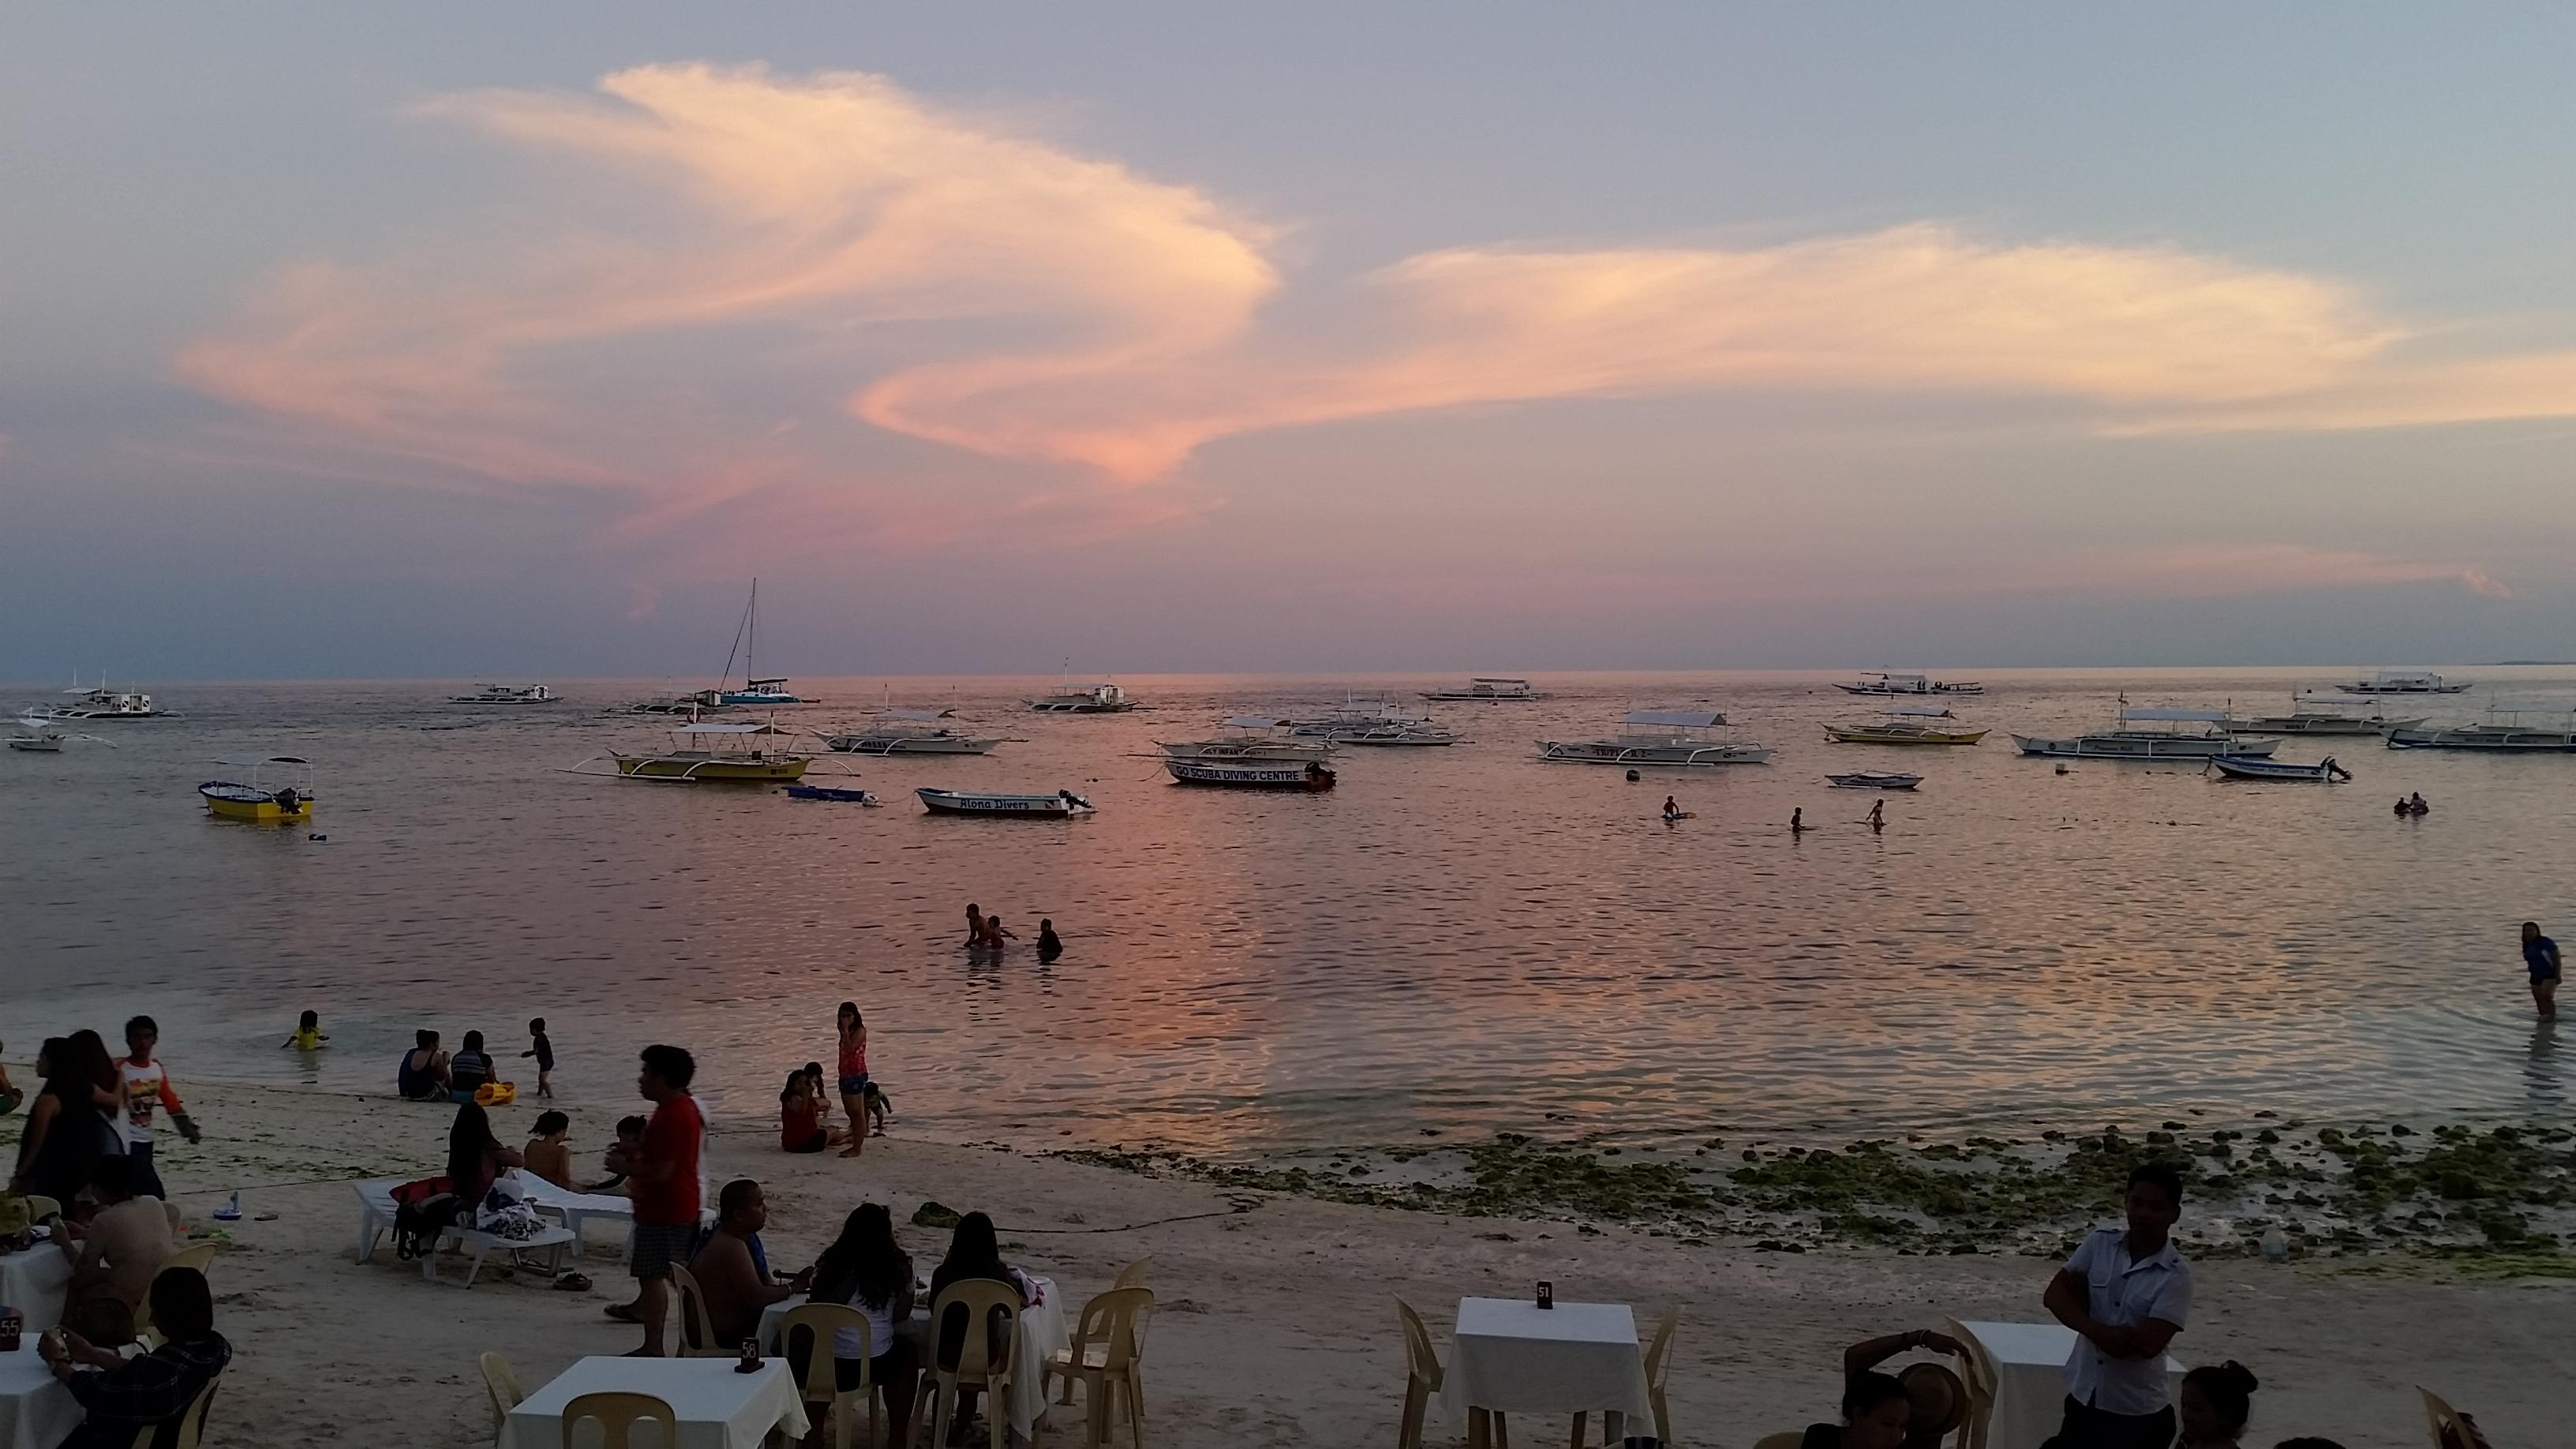 rencontres Cebu en ligne datation Dhaka